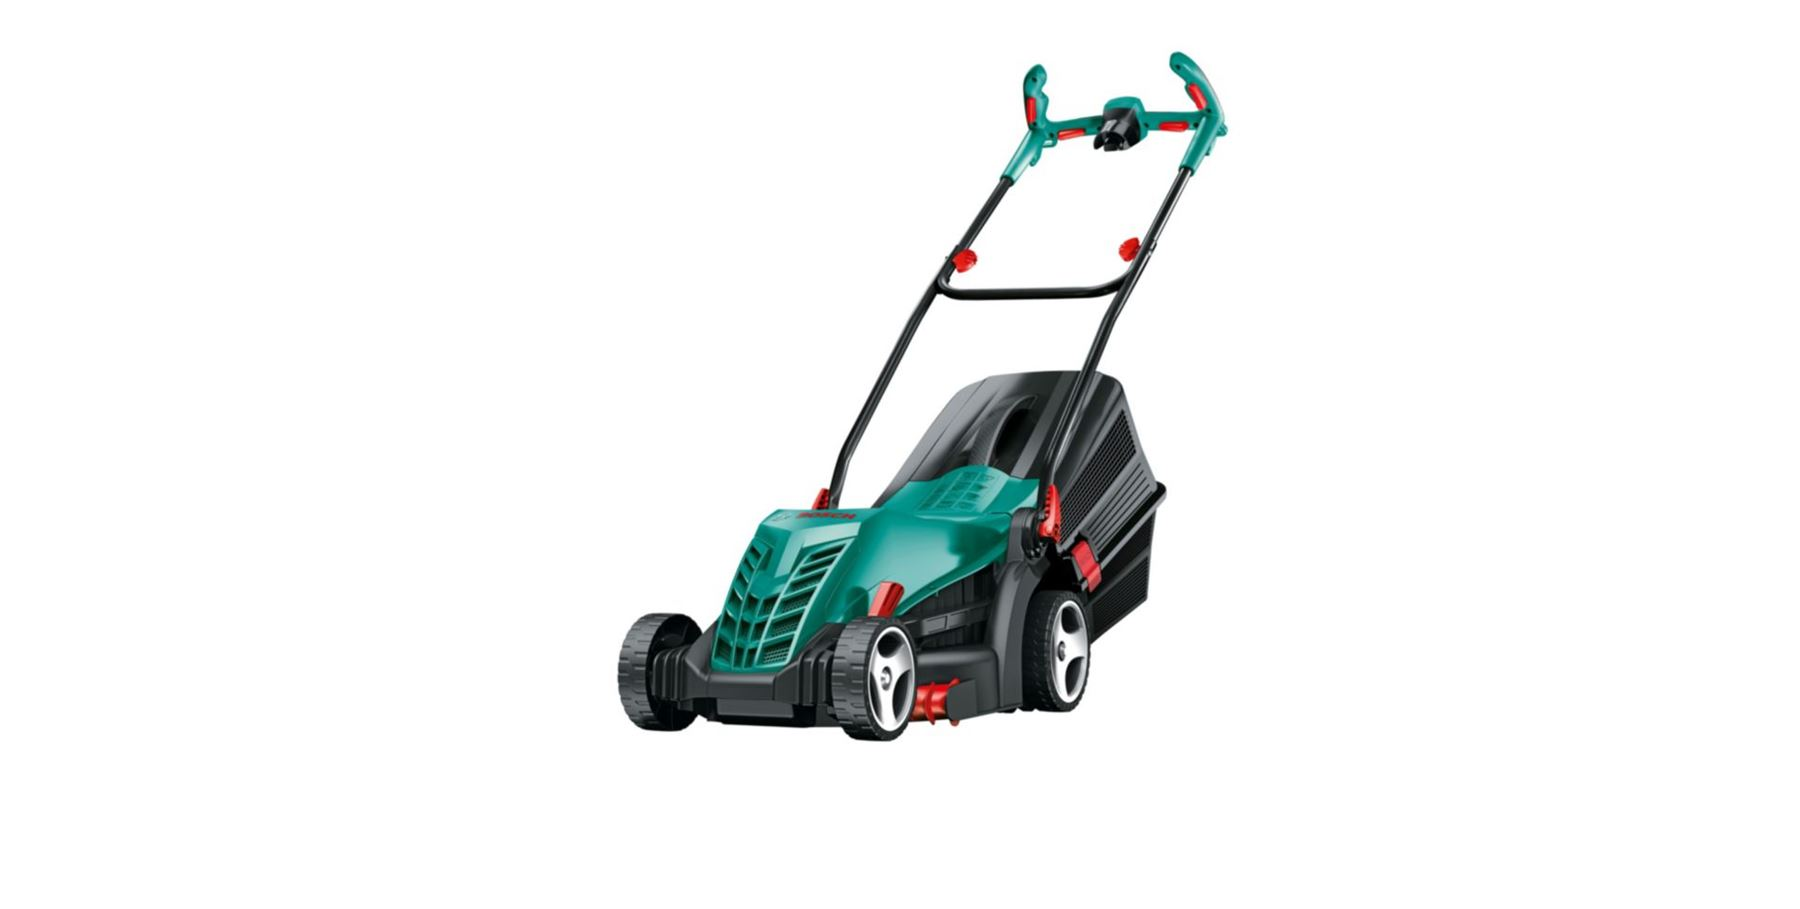 bosch rotak 370 er 430 er ergoflex electric corded rotary lawnmower trimmer. Black Bedroom Furniture Sets. Home Design Ideas